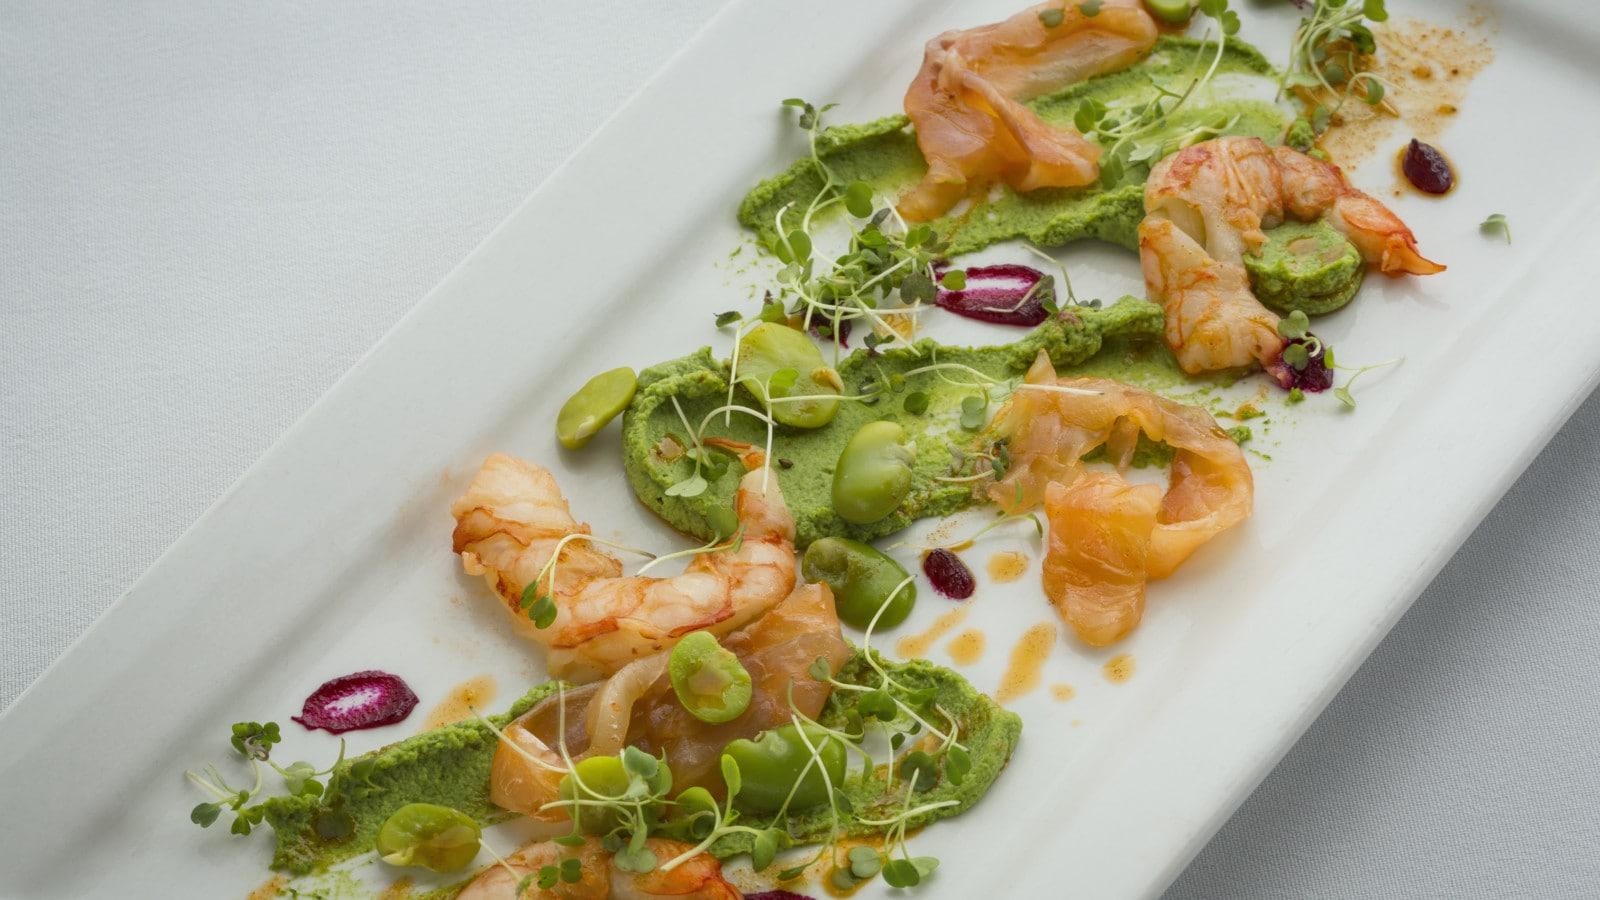 meilleurs restaurants la malbaie charlevoix